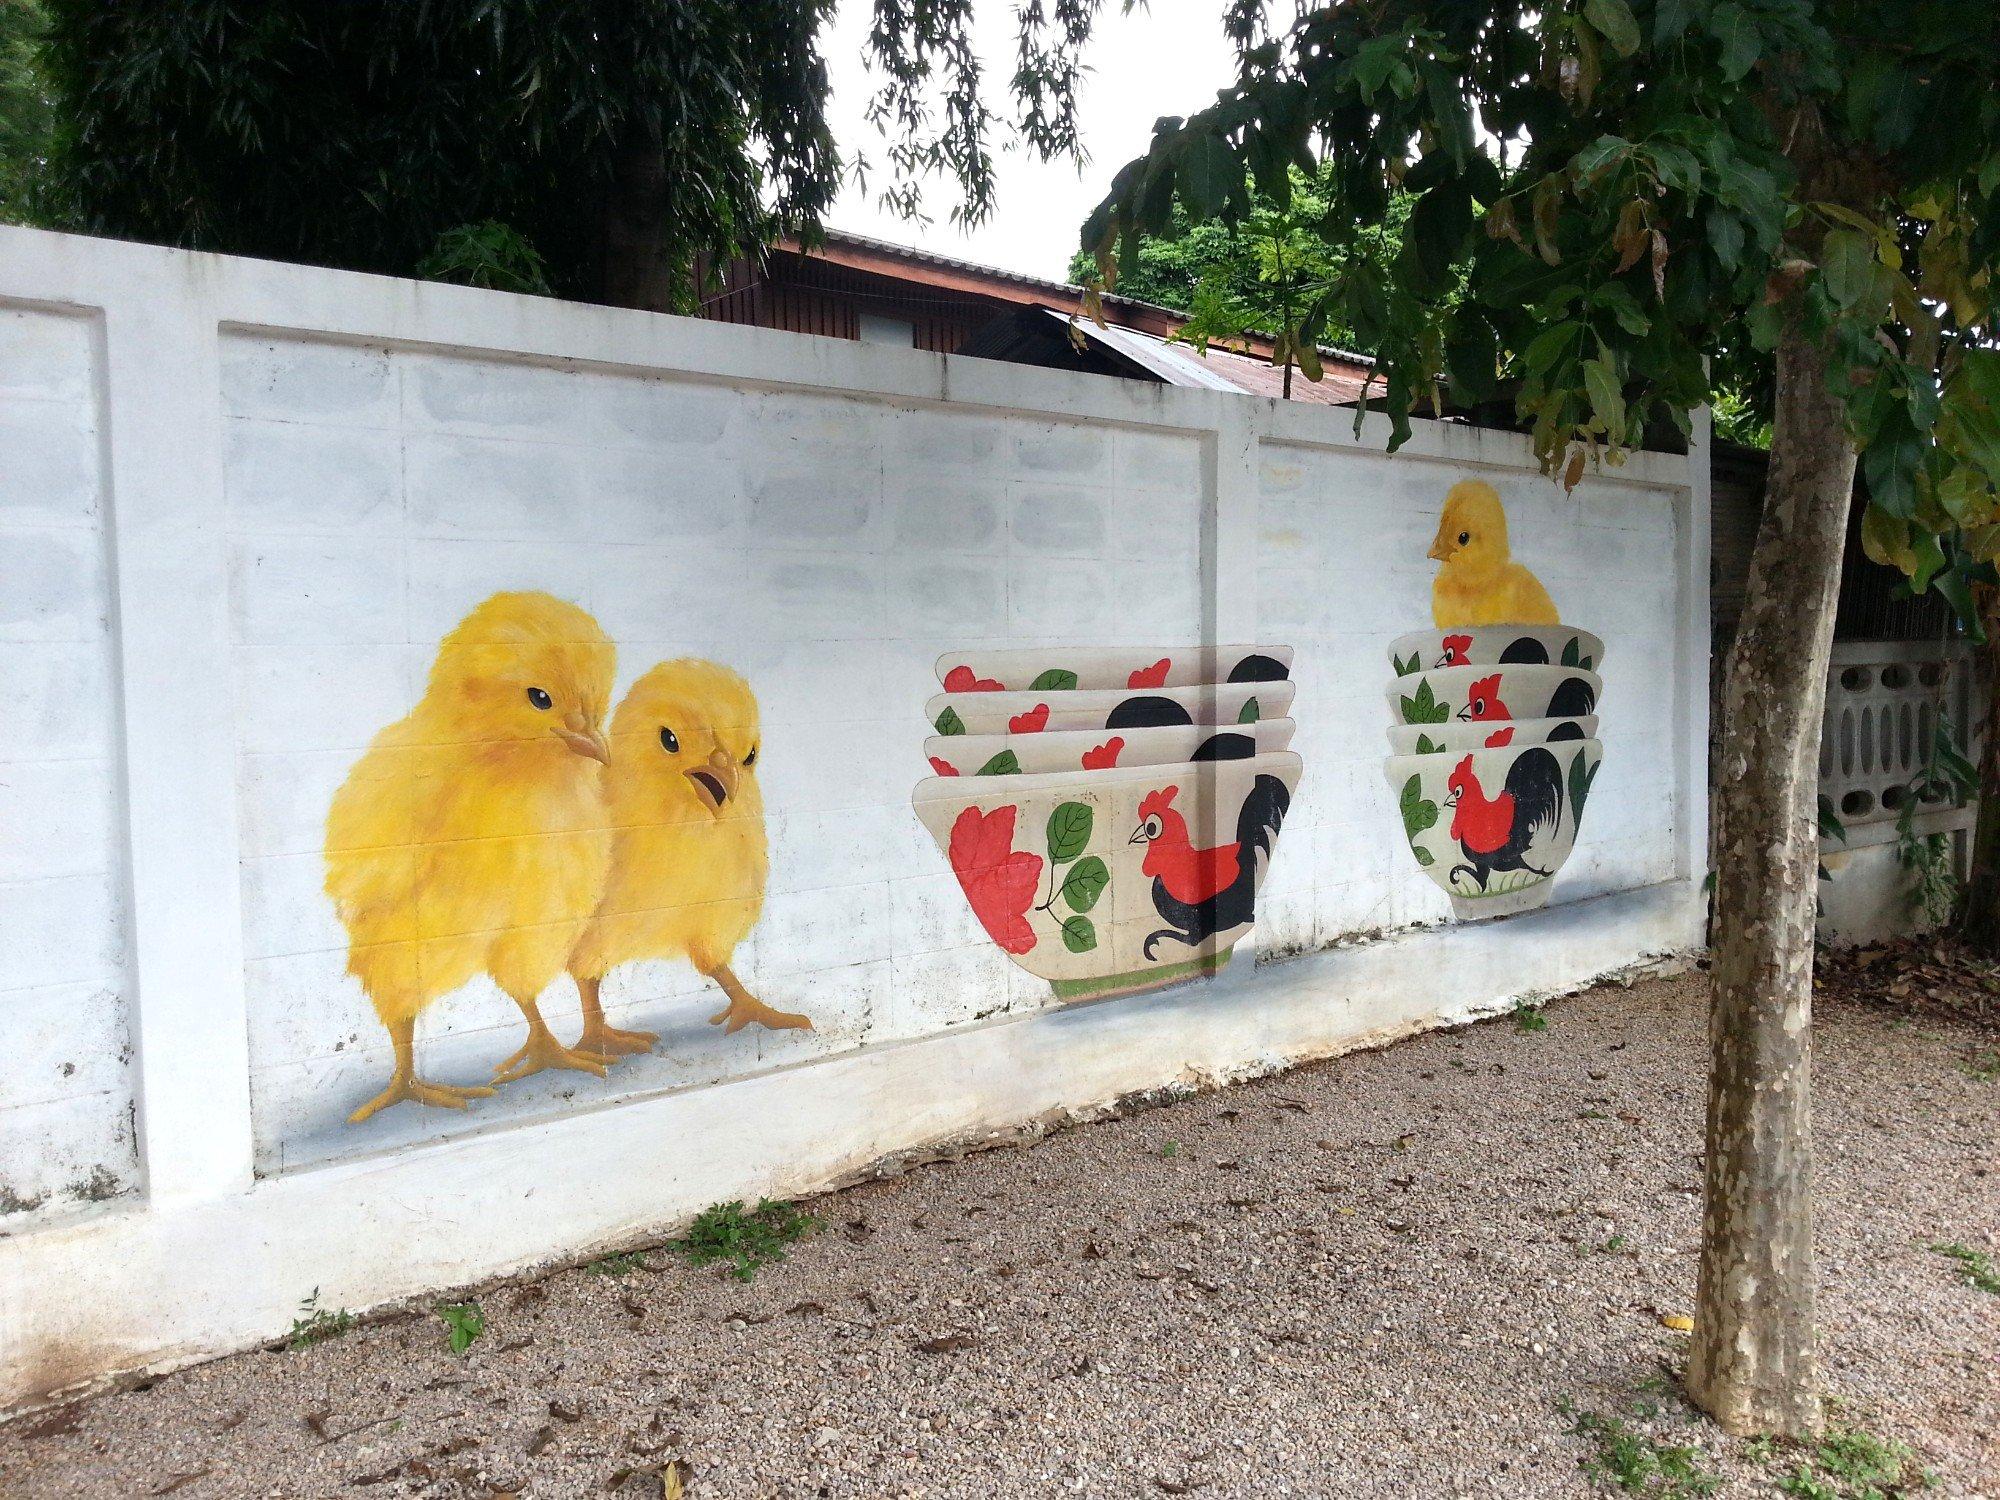 Chicks in bowls mural in Lampang